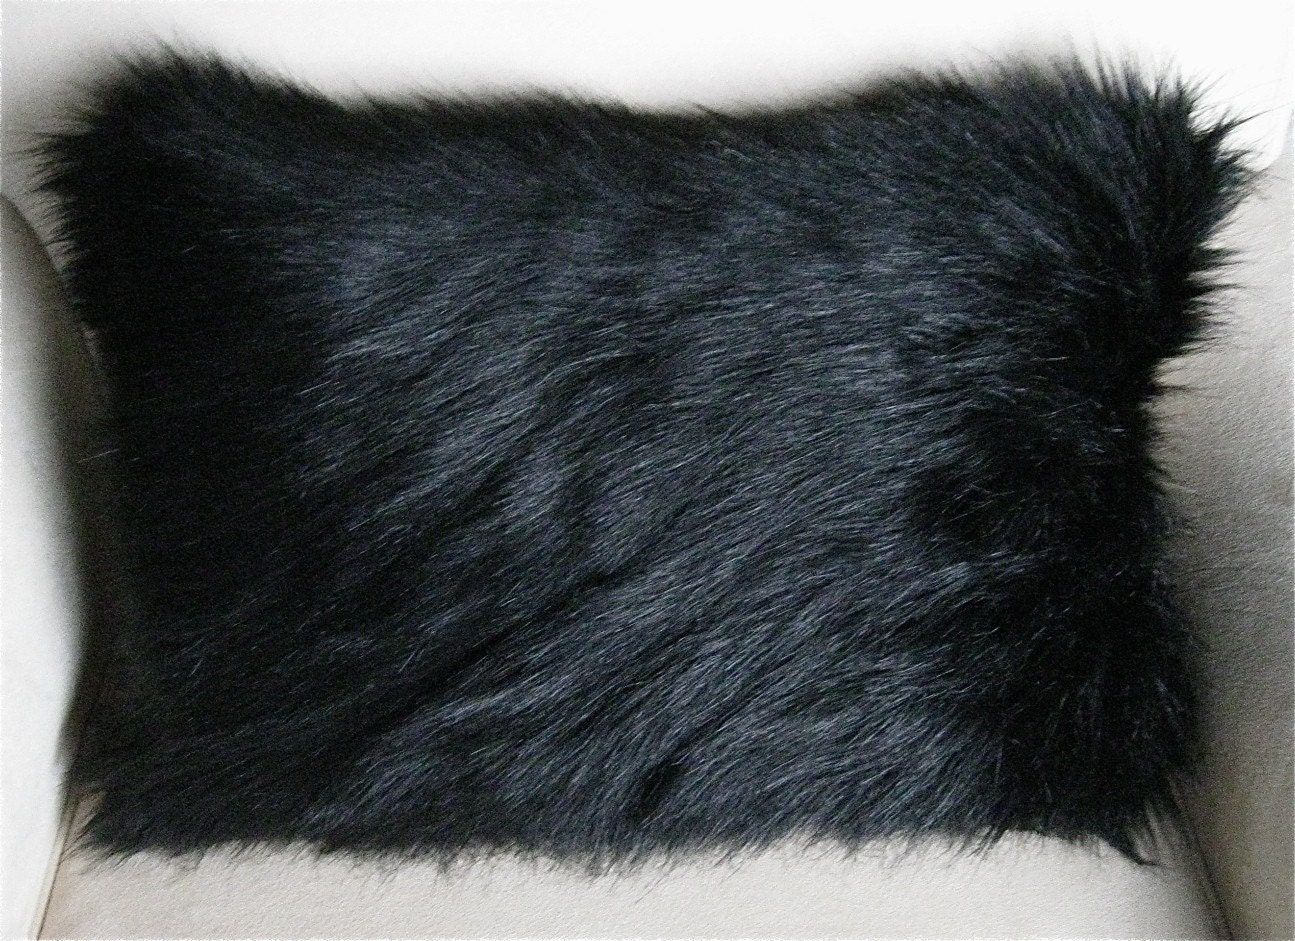 Half Off Sale Black Bear Faux Fur Pillow Cushion 12x18 Inch